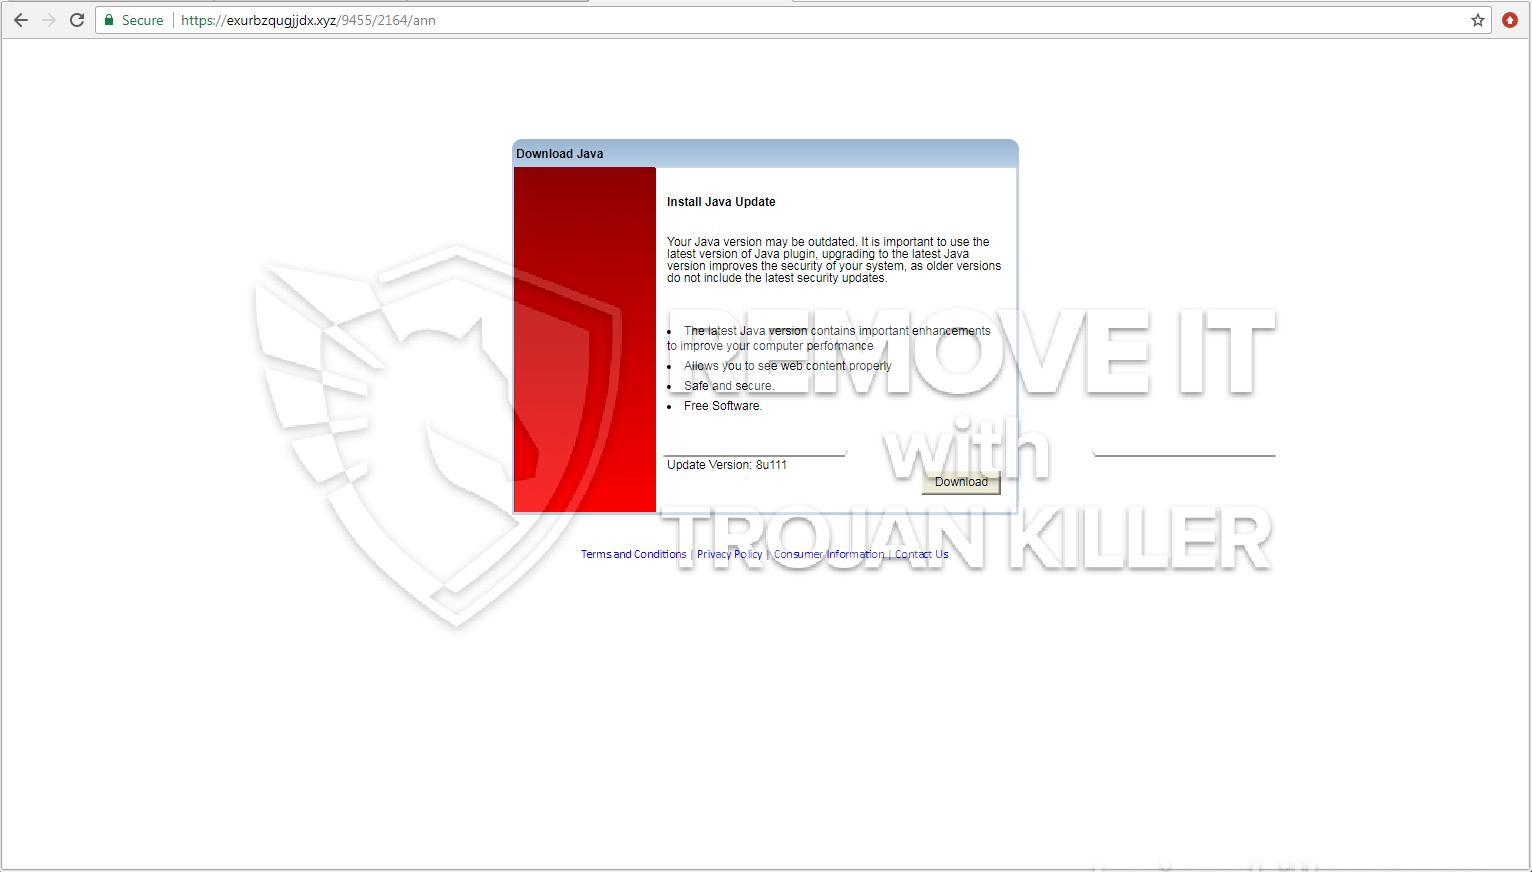 remove Exurbzqugjjdx.xyz virus